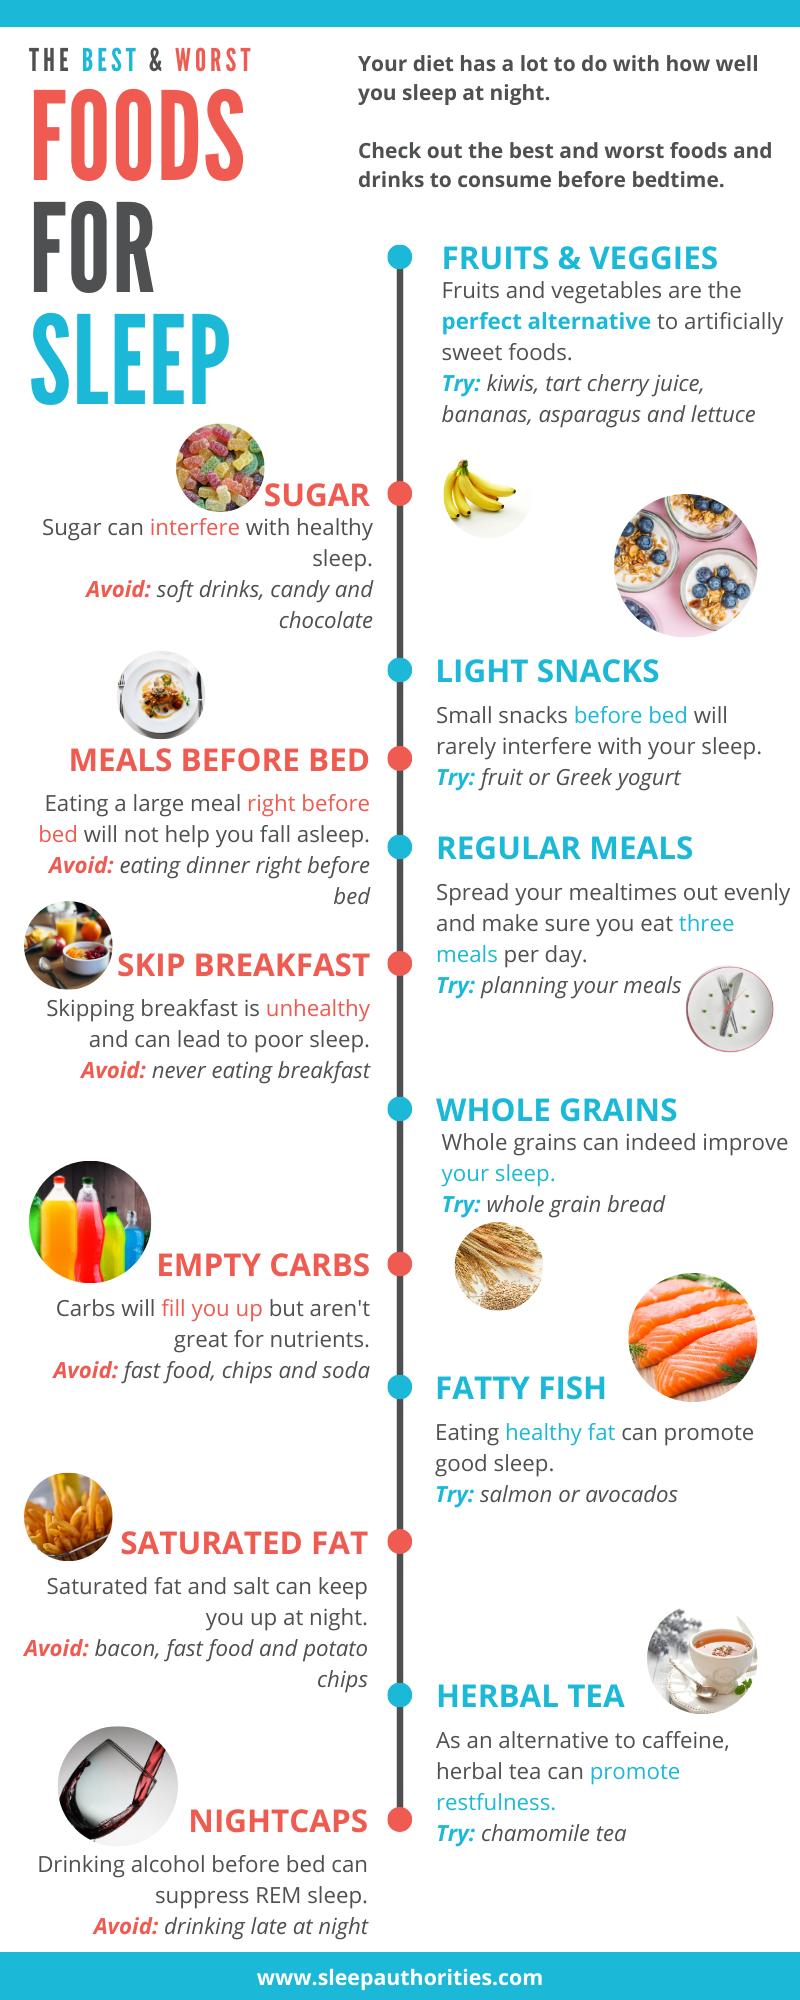 Best Worst Foods For Sleep Food For Sleep Better Sleep How To Sleep Faster